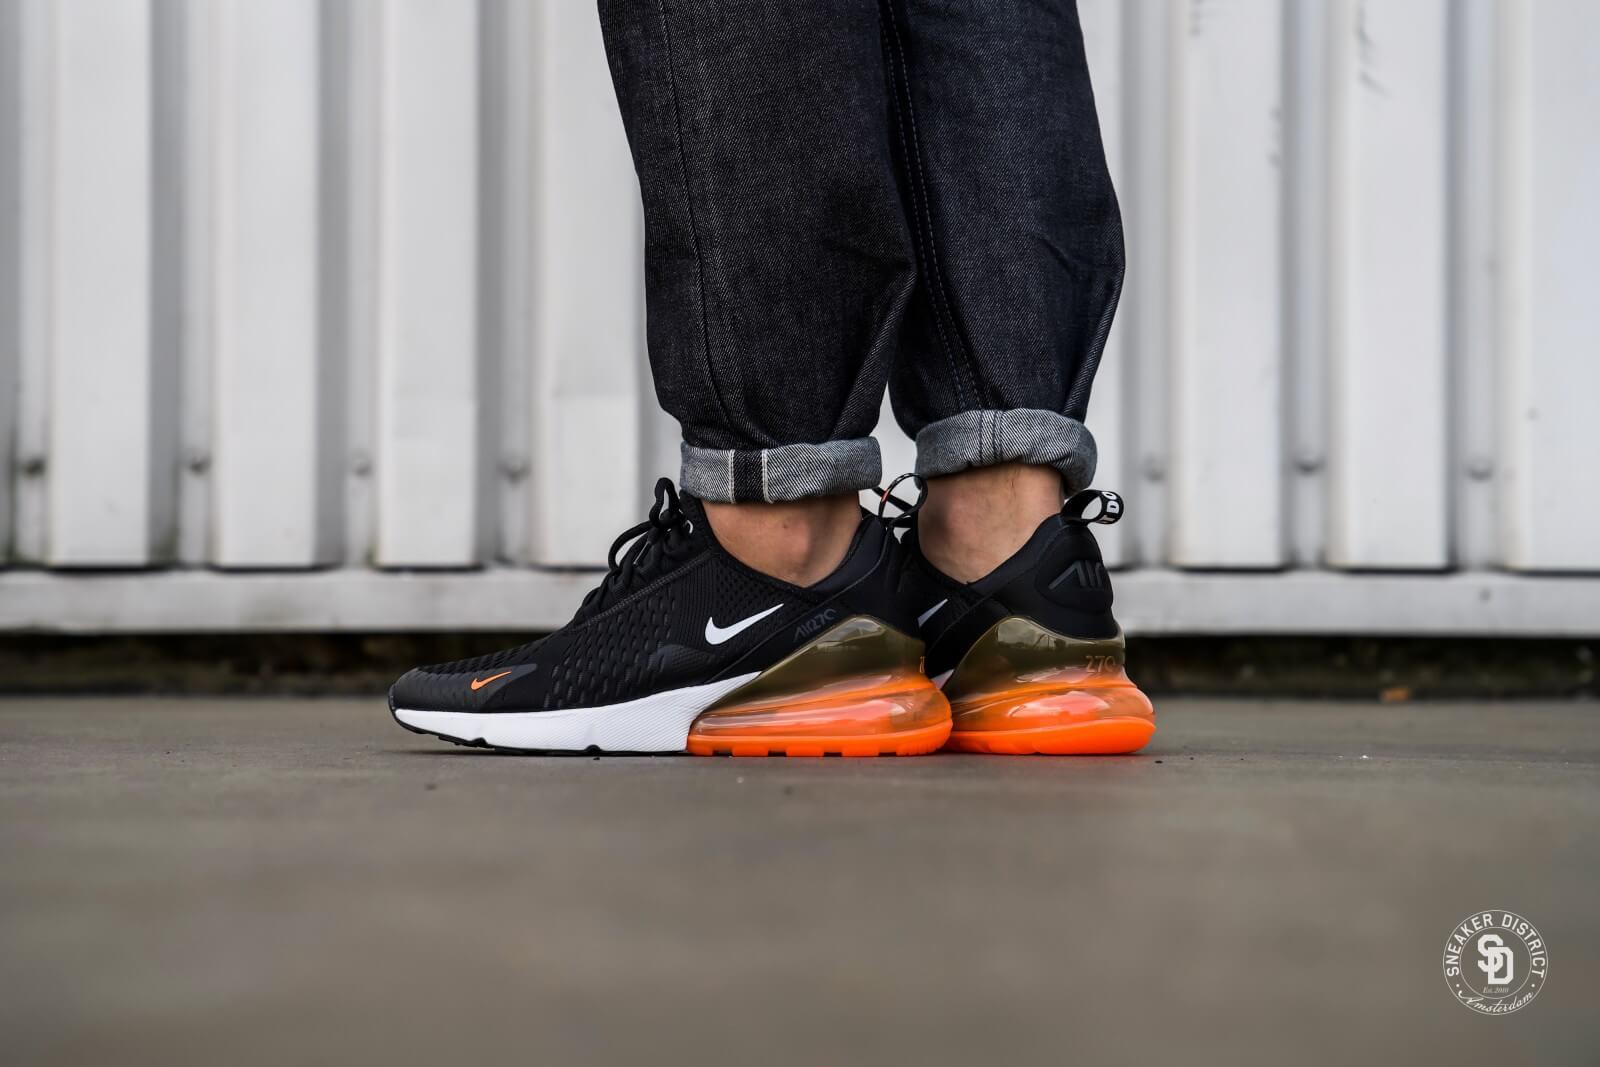 Nike Air Max 270 BlackWhite Total Orange AH8050 014